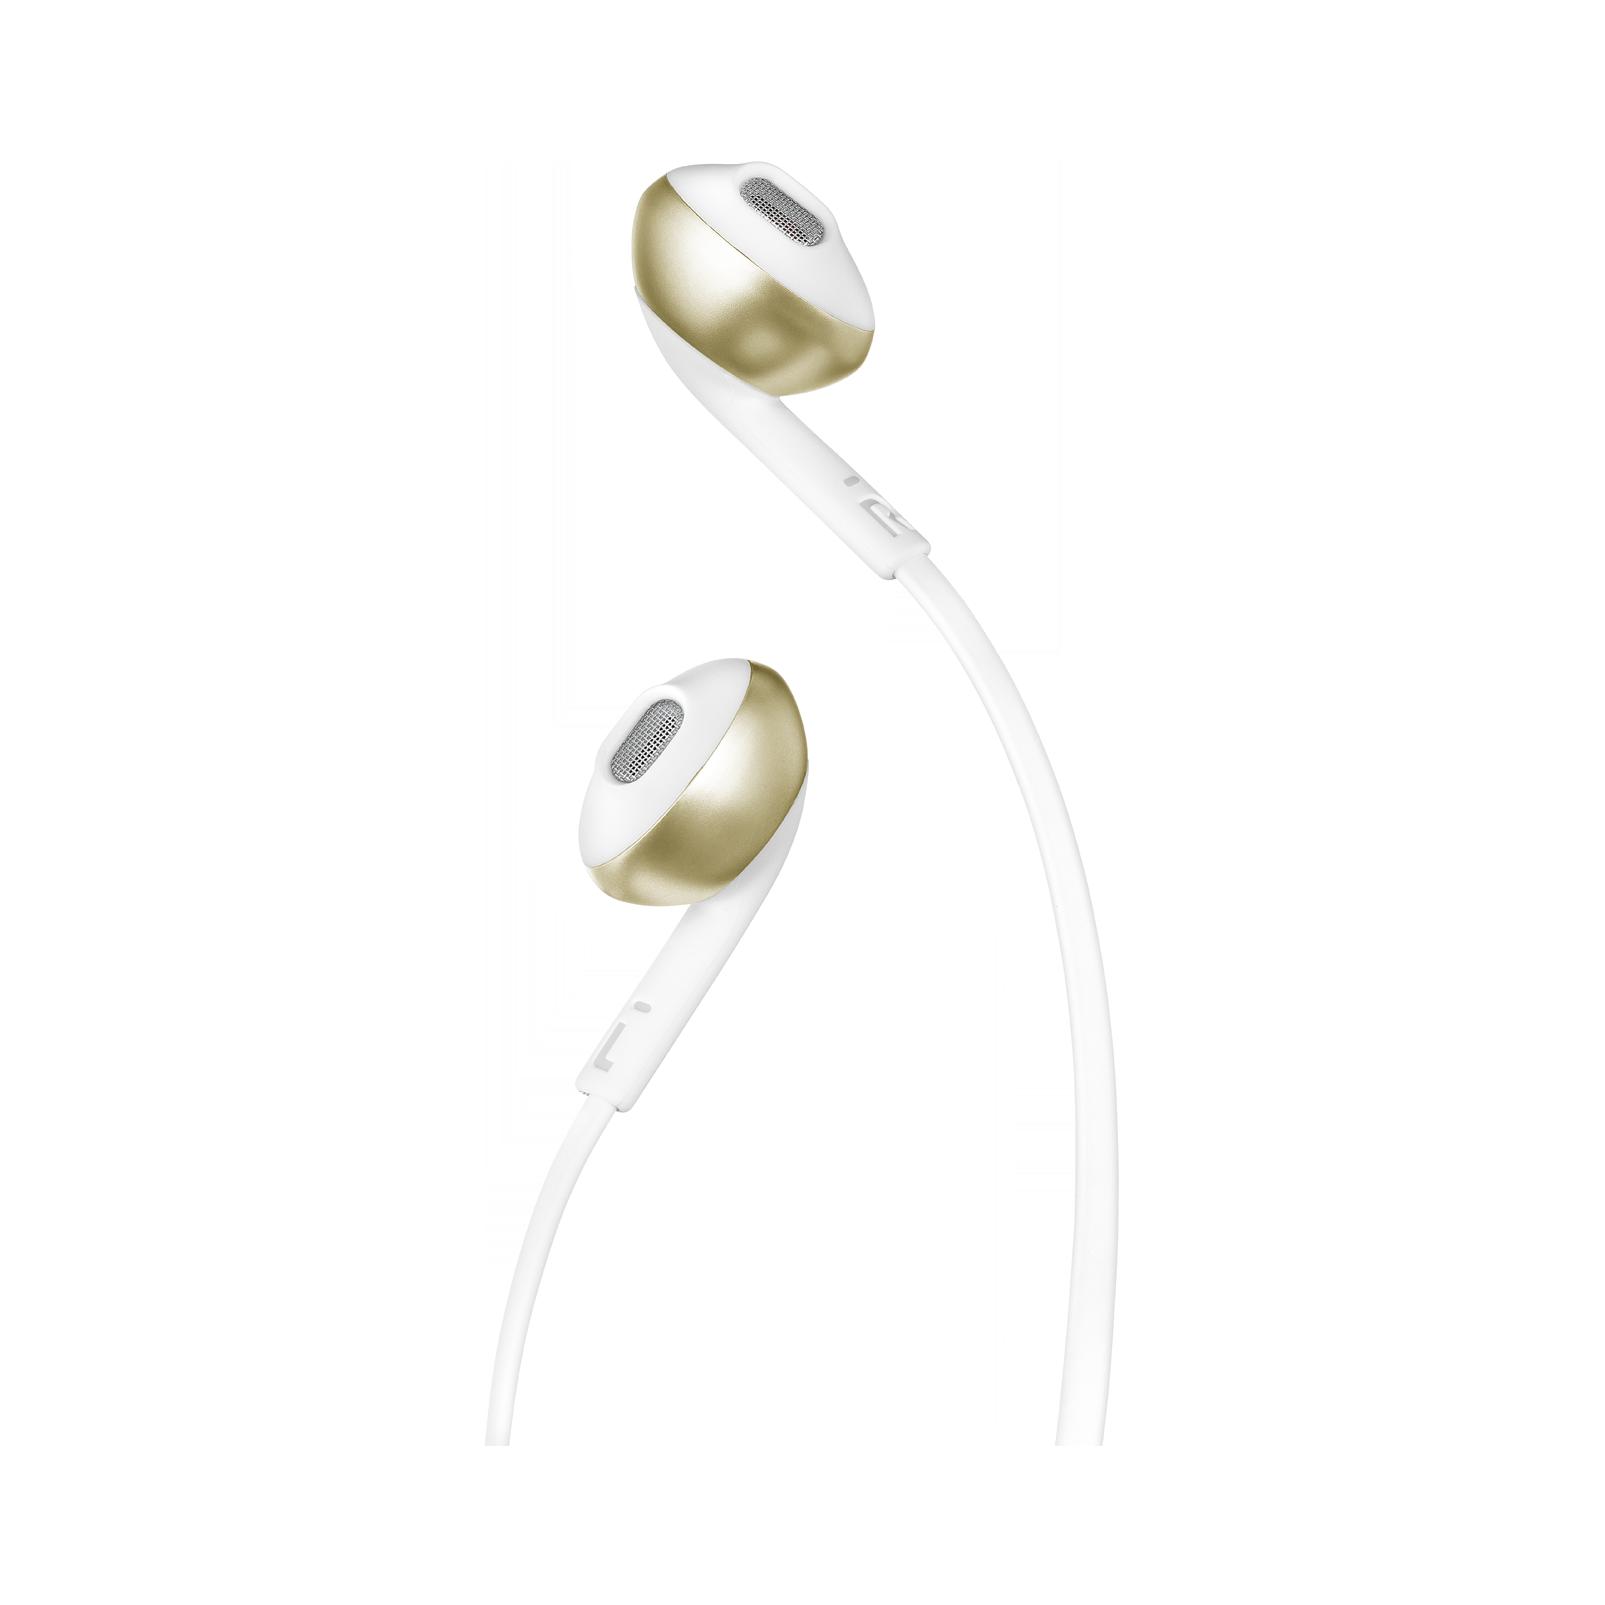 JBL TUNE 205 - Champagne Gold - Earbud headphones - Detailshot 1